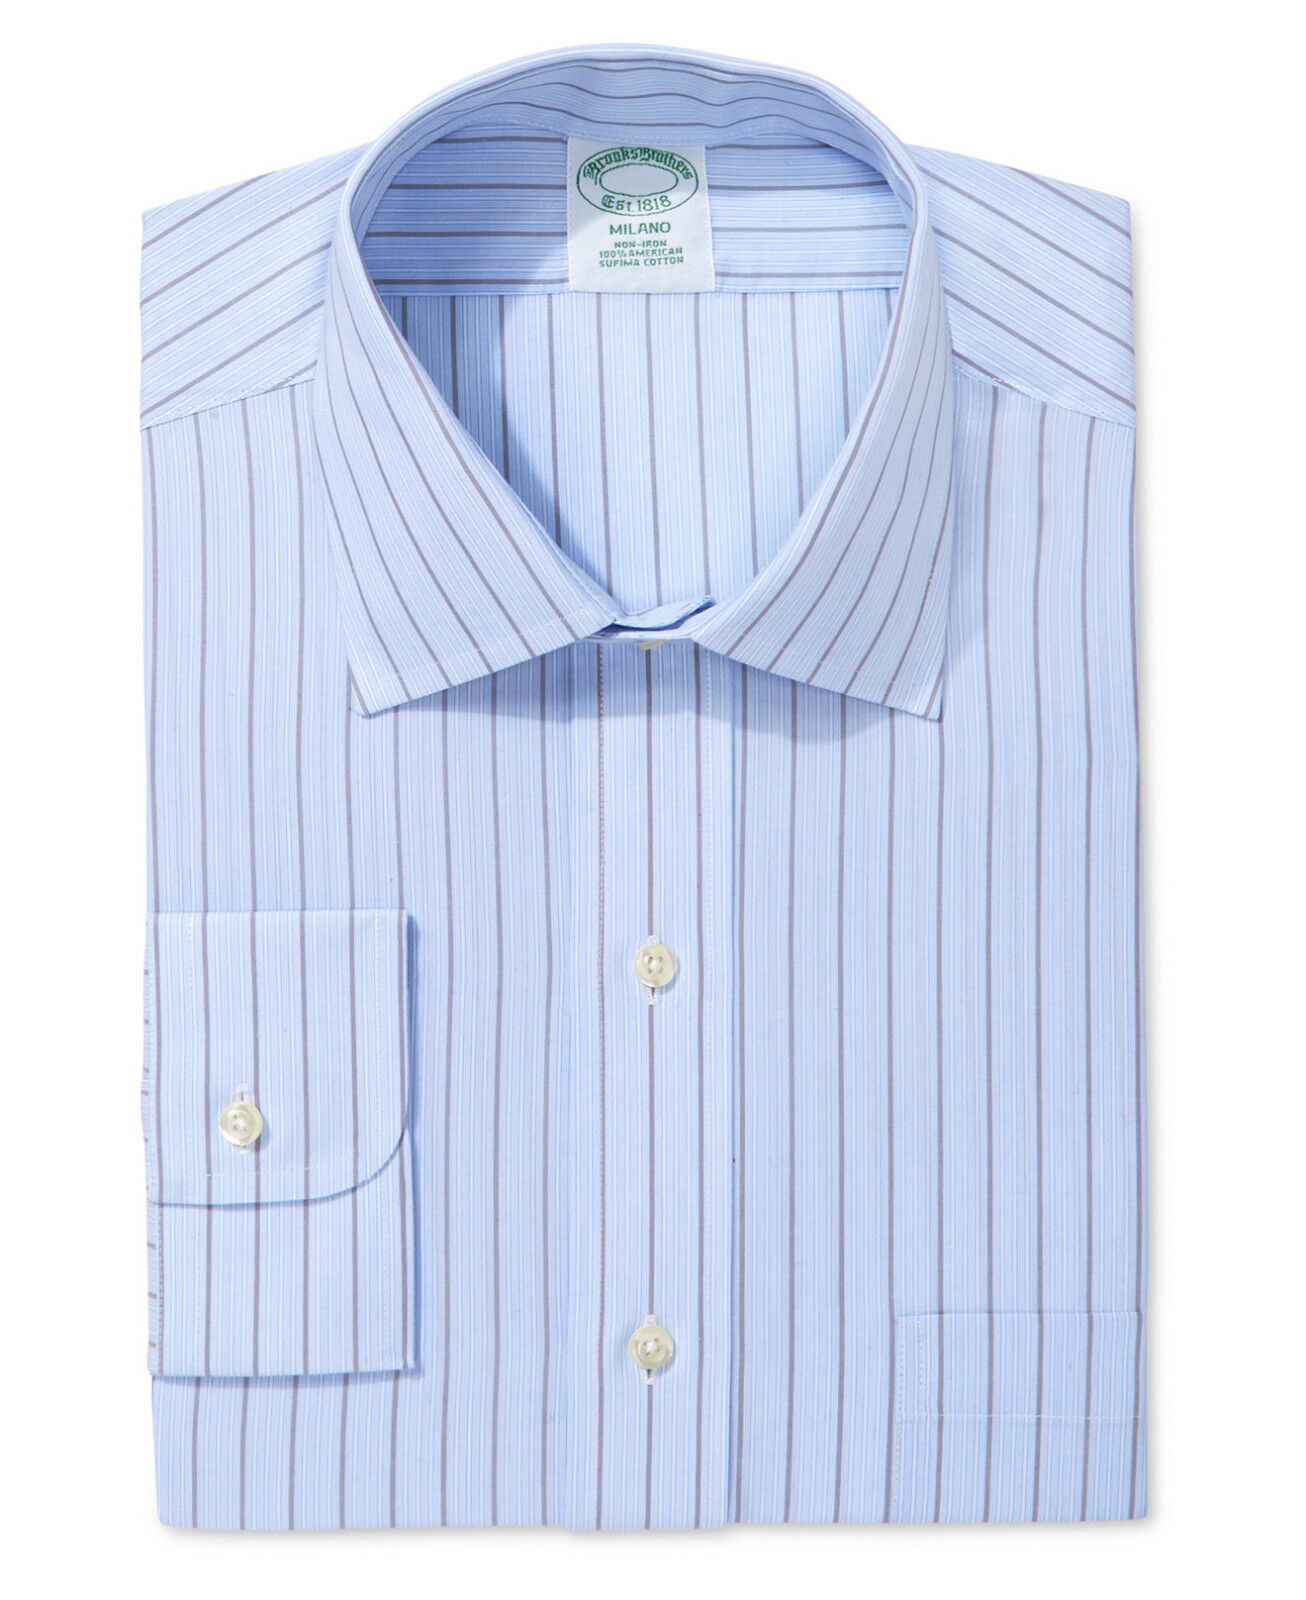 NWT BROOKS BredHERS Milano Extra Slim Fit Non-Iron Stripe Dress Shirt Sz 17 33